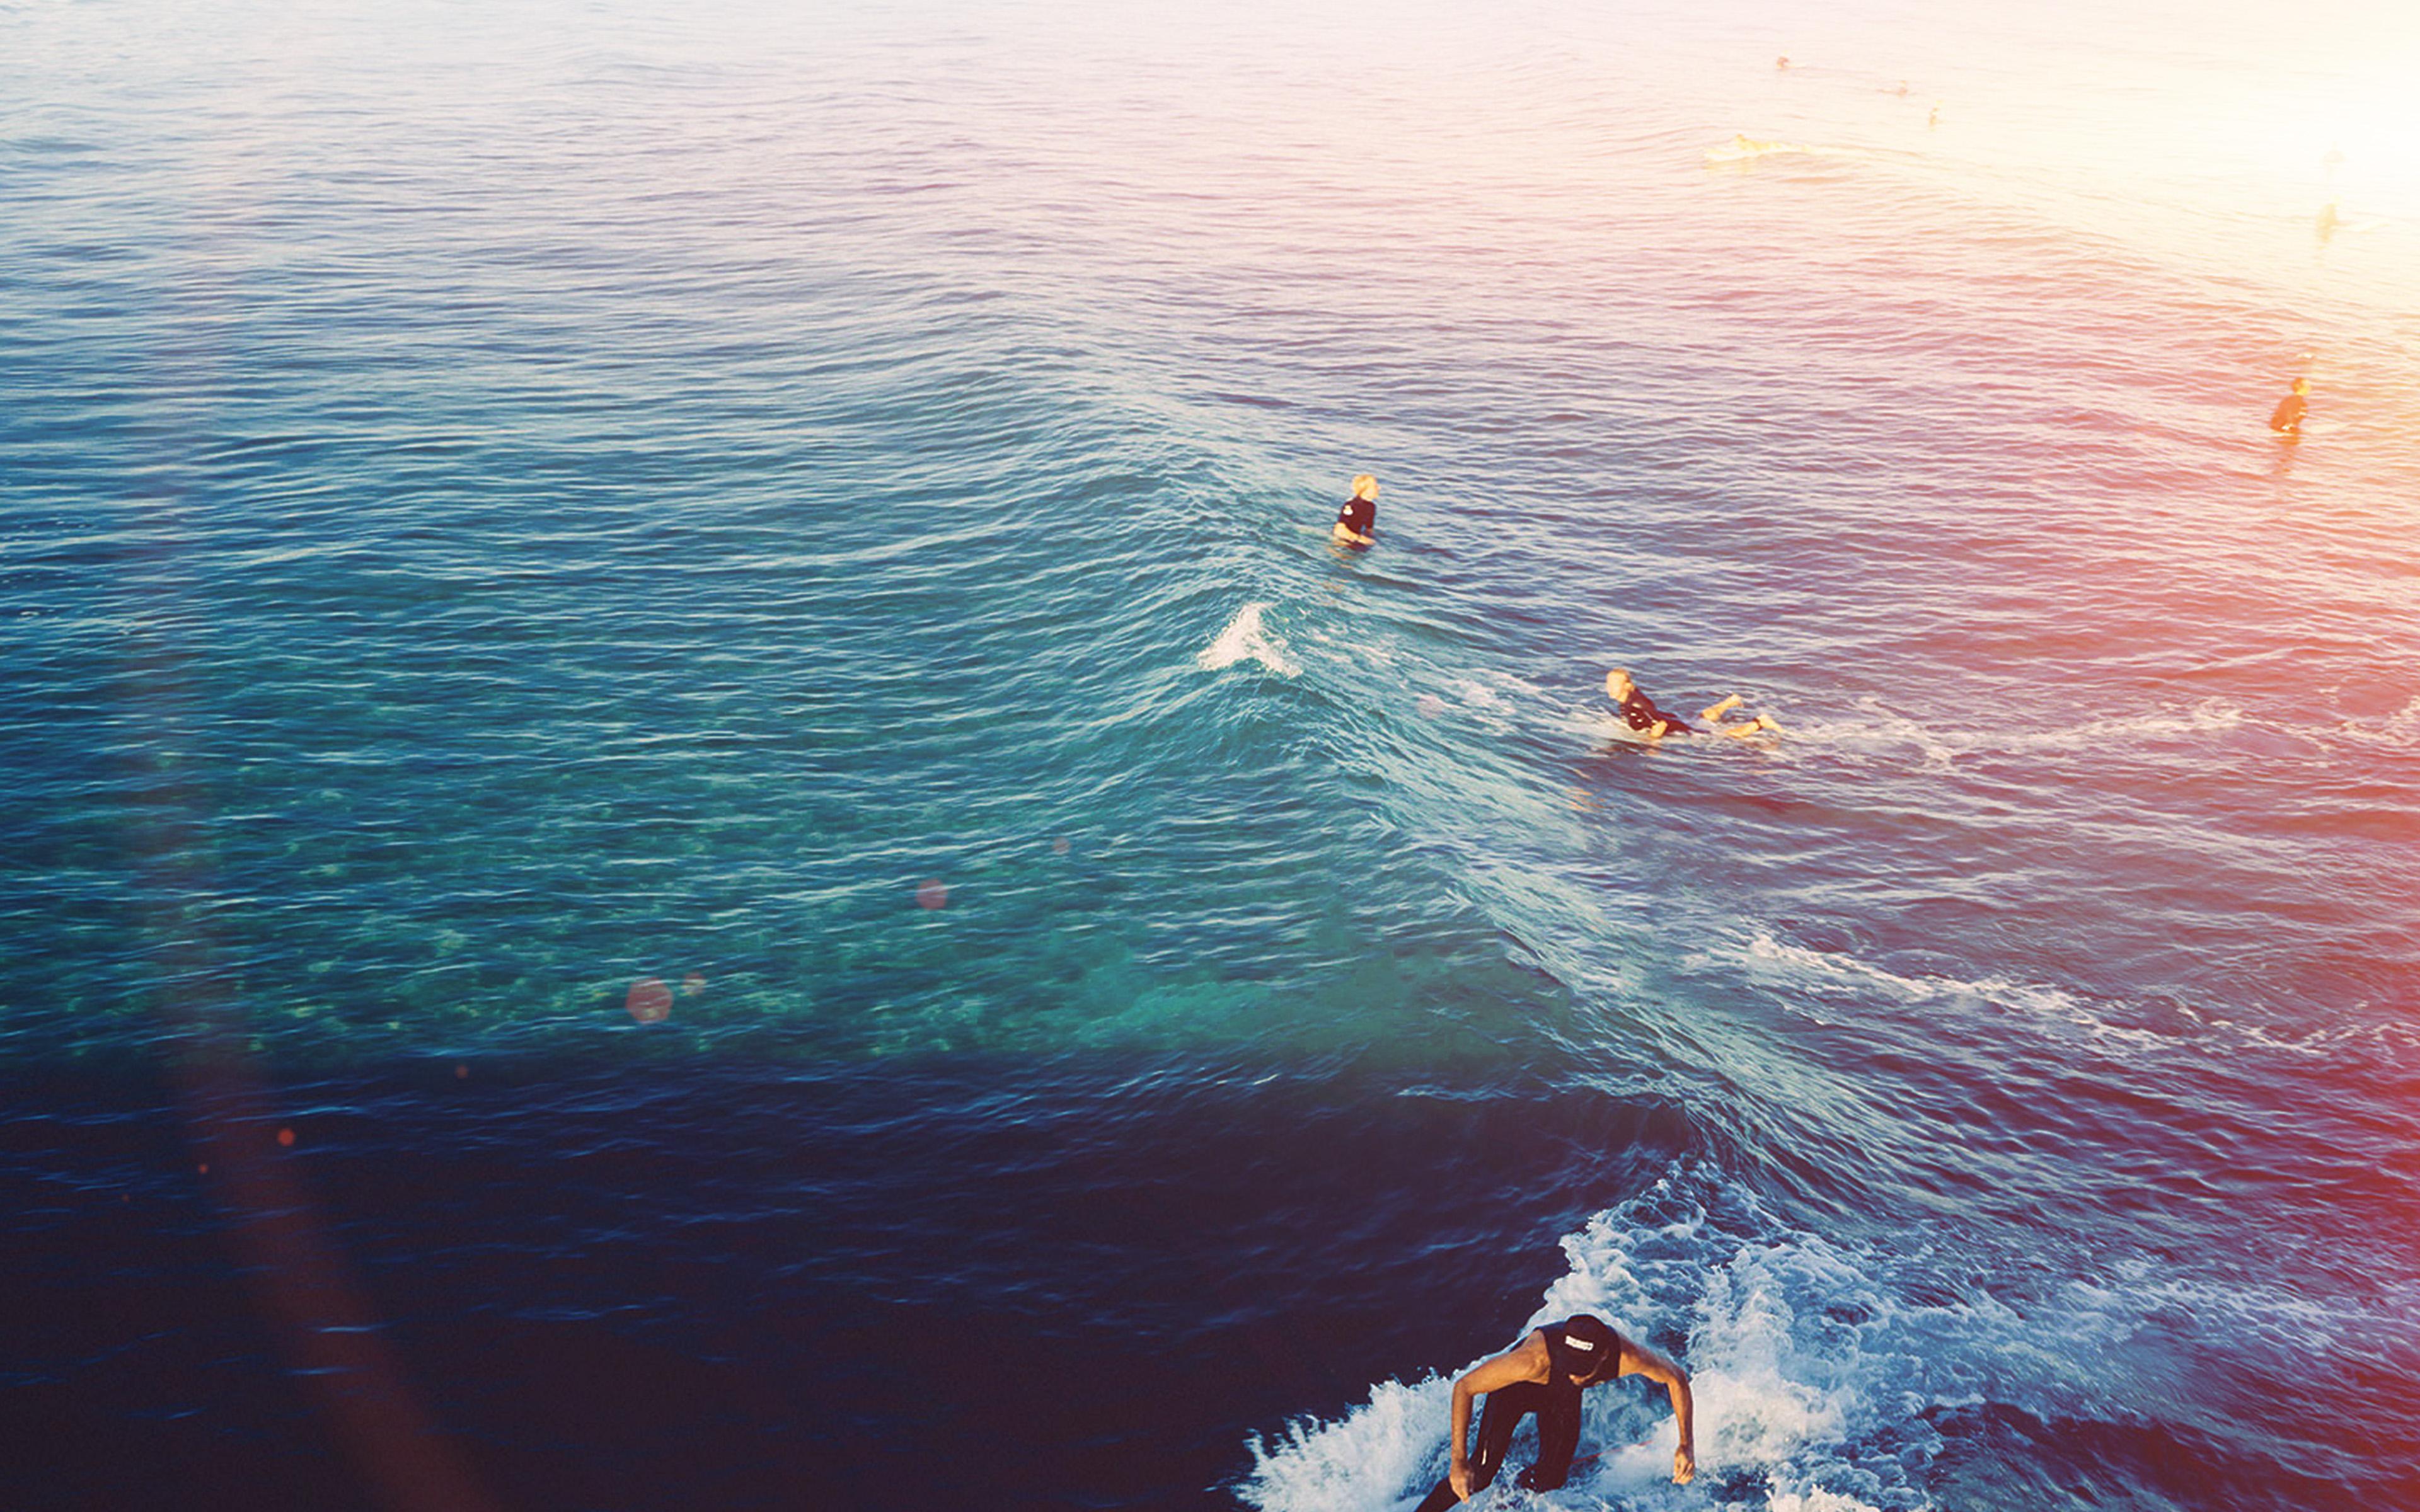 Ms59 Surfing Wave Summer Sea Ocean Flare Wallpaper